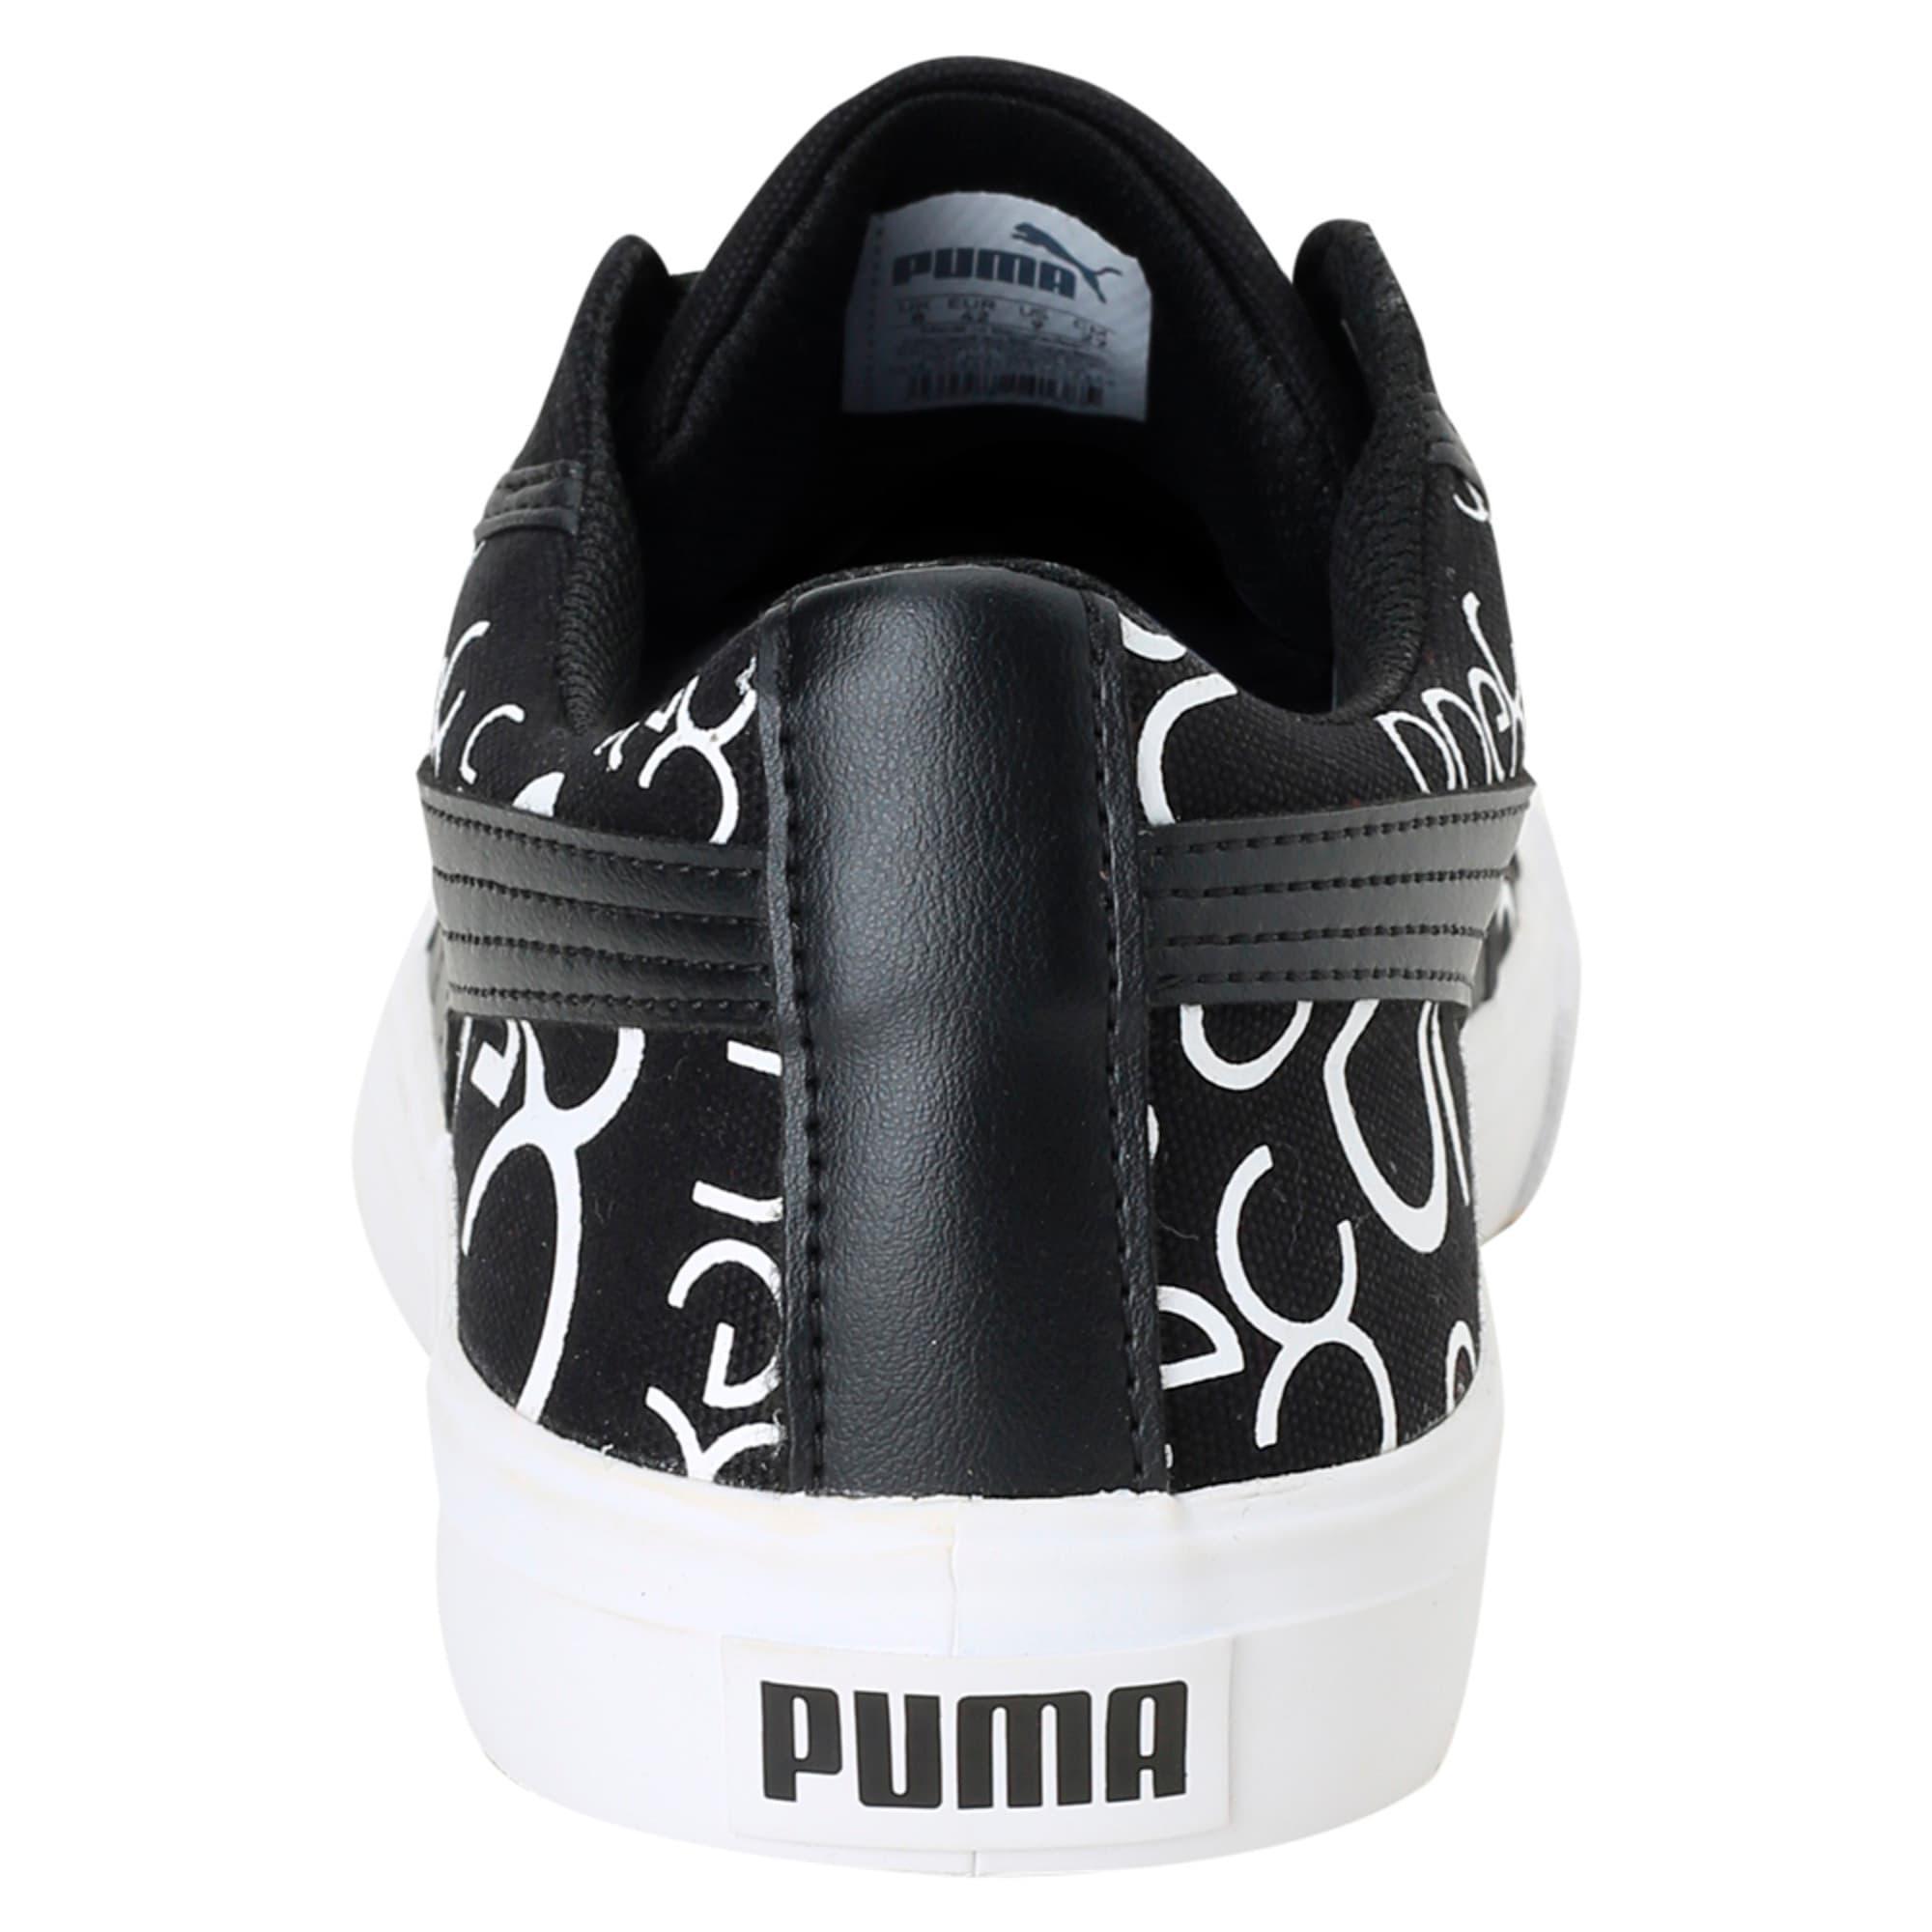 Thumbnail 4 of one8 Men's Sneakers, Black-White-Pomegranate, medium-IND